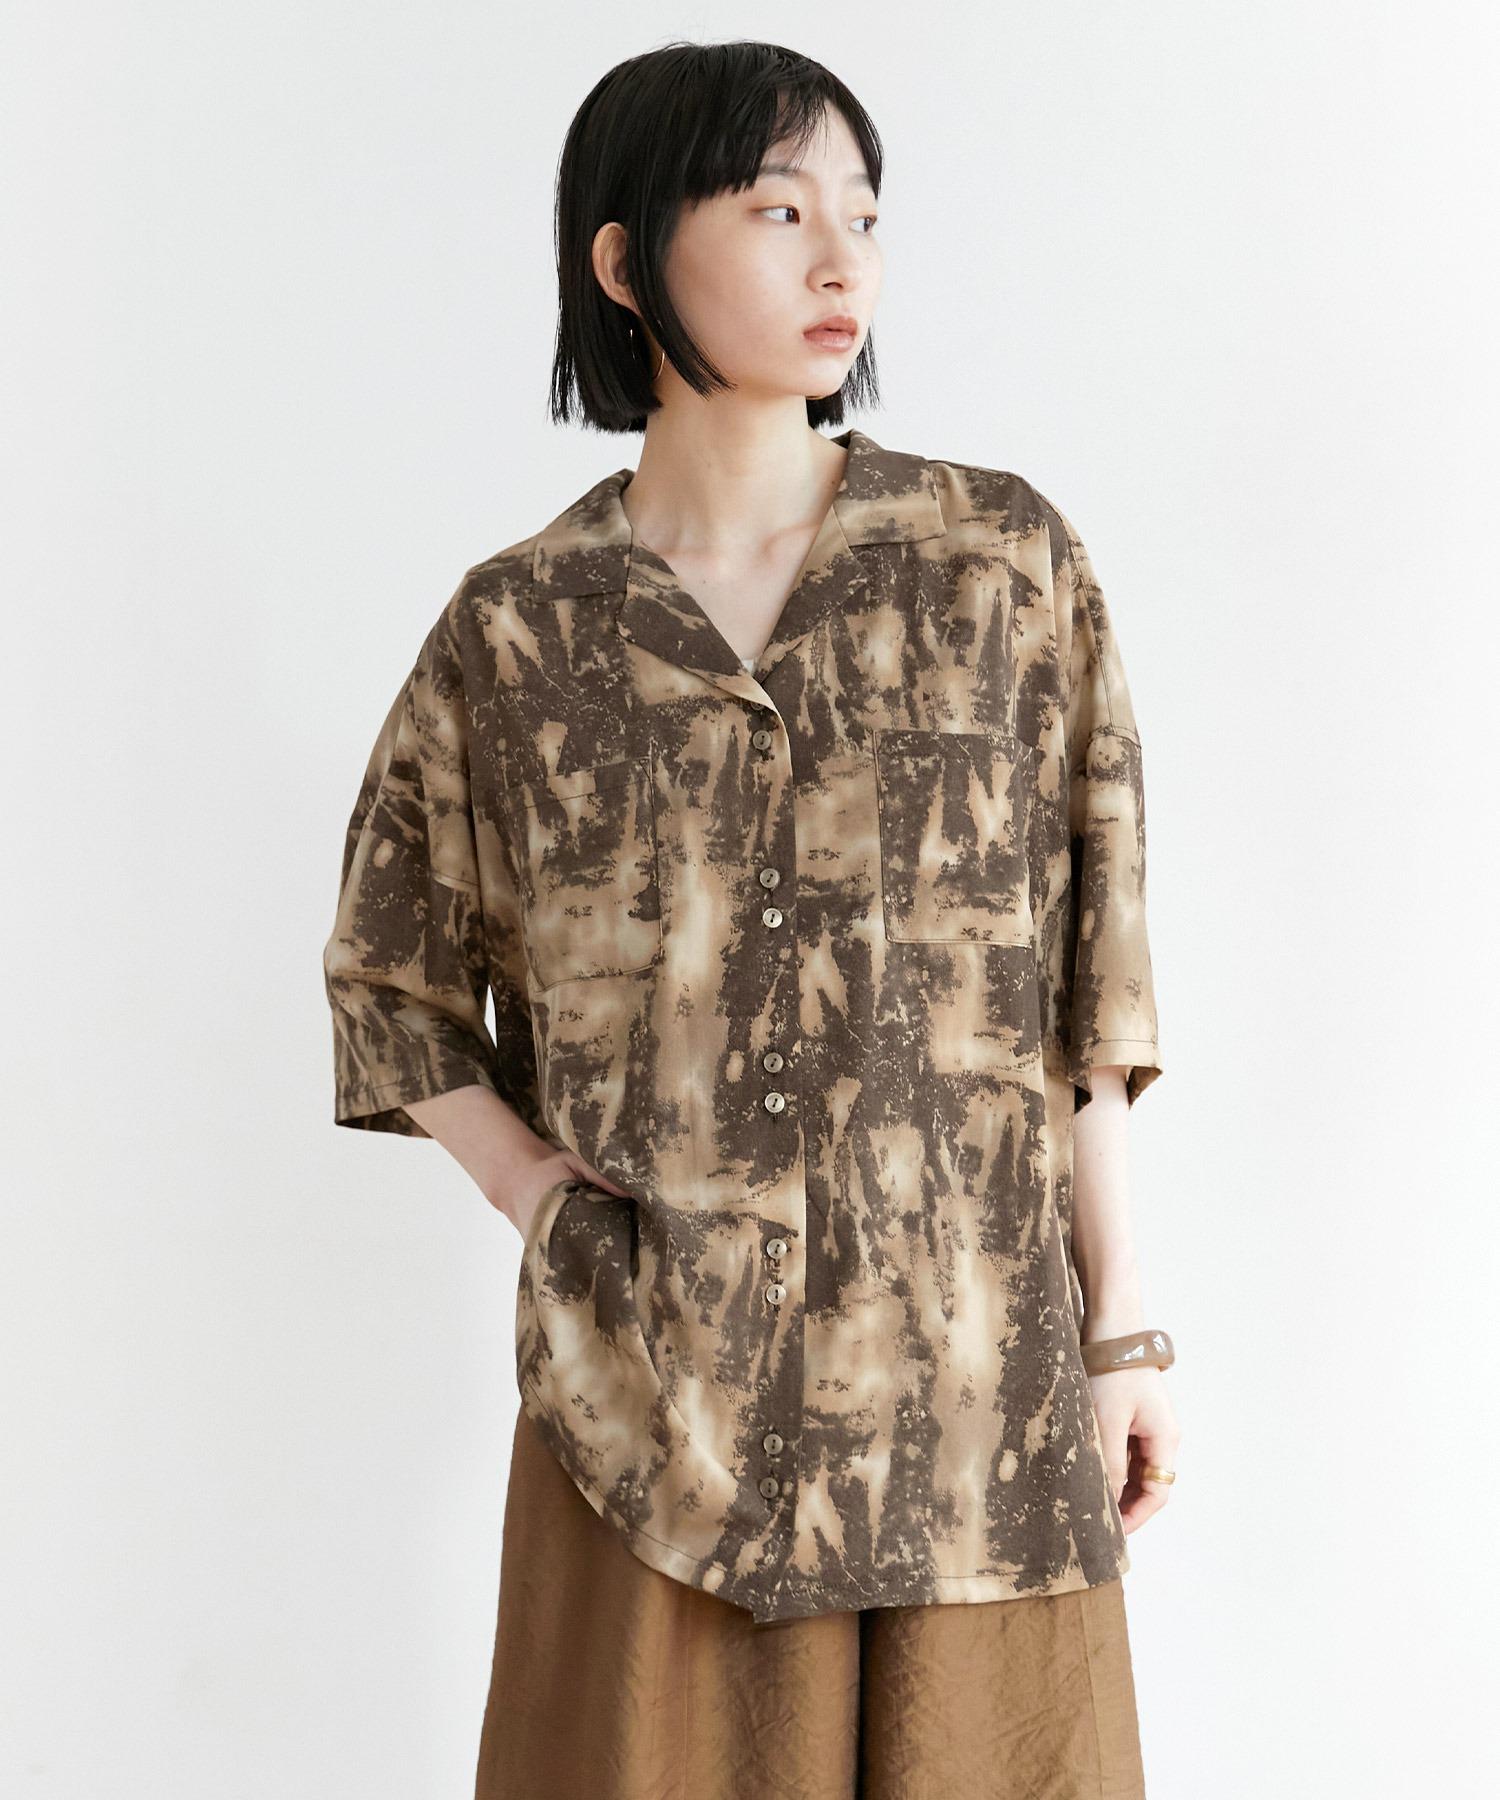 【EMMA】水彩アートプリント半袖シャツ